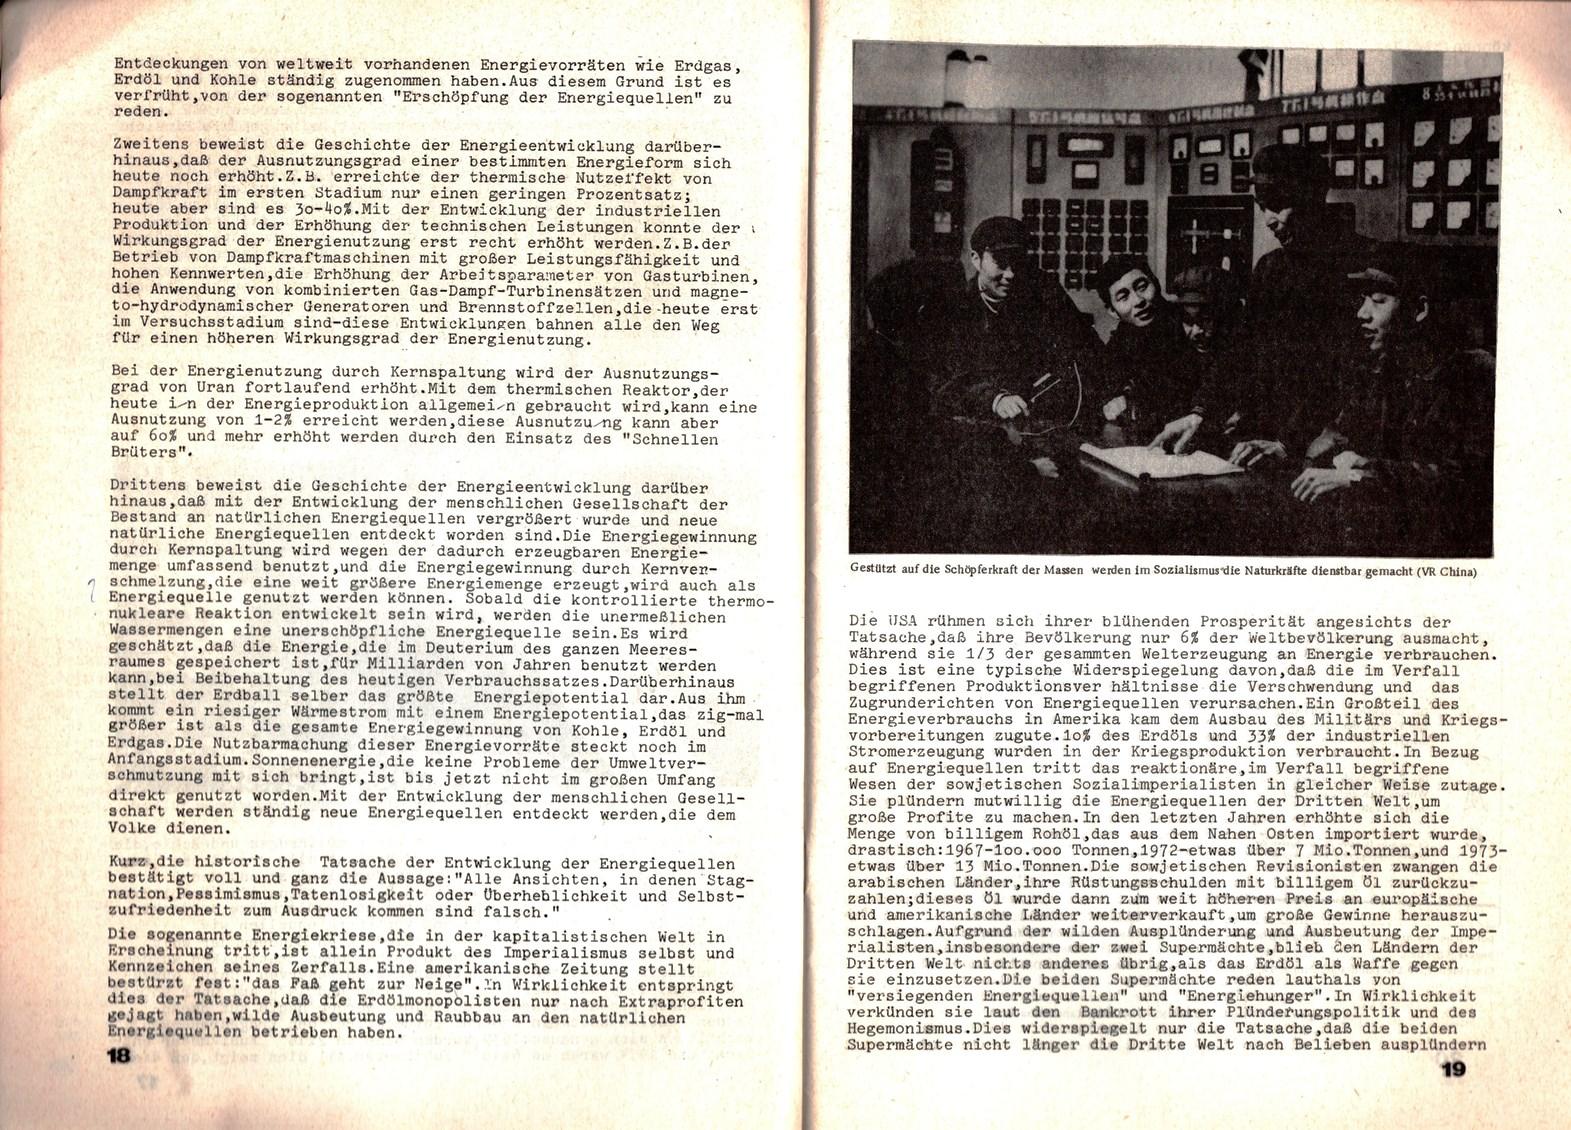 KSV_1976_Atomenergie_im_Kapitalismus_011